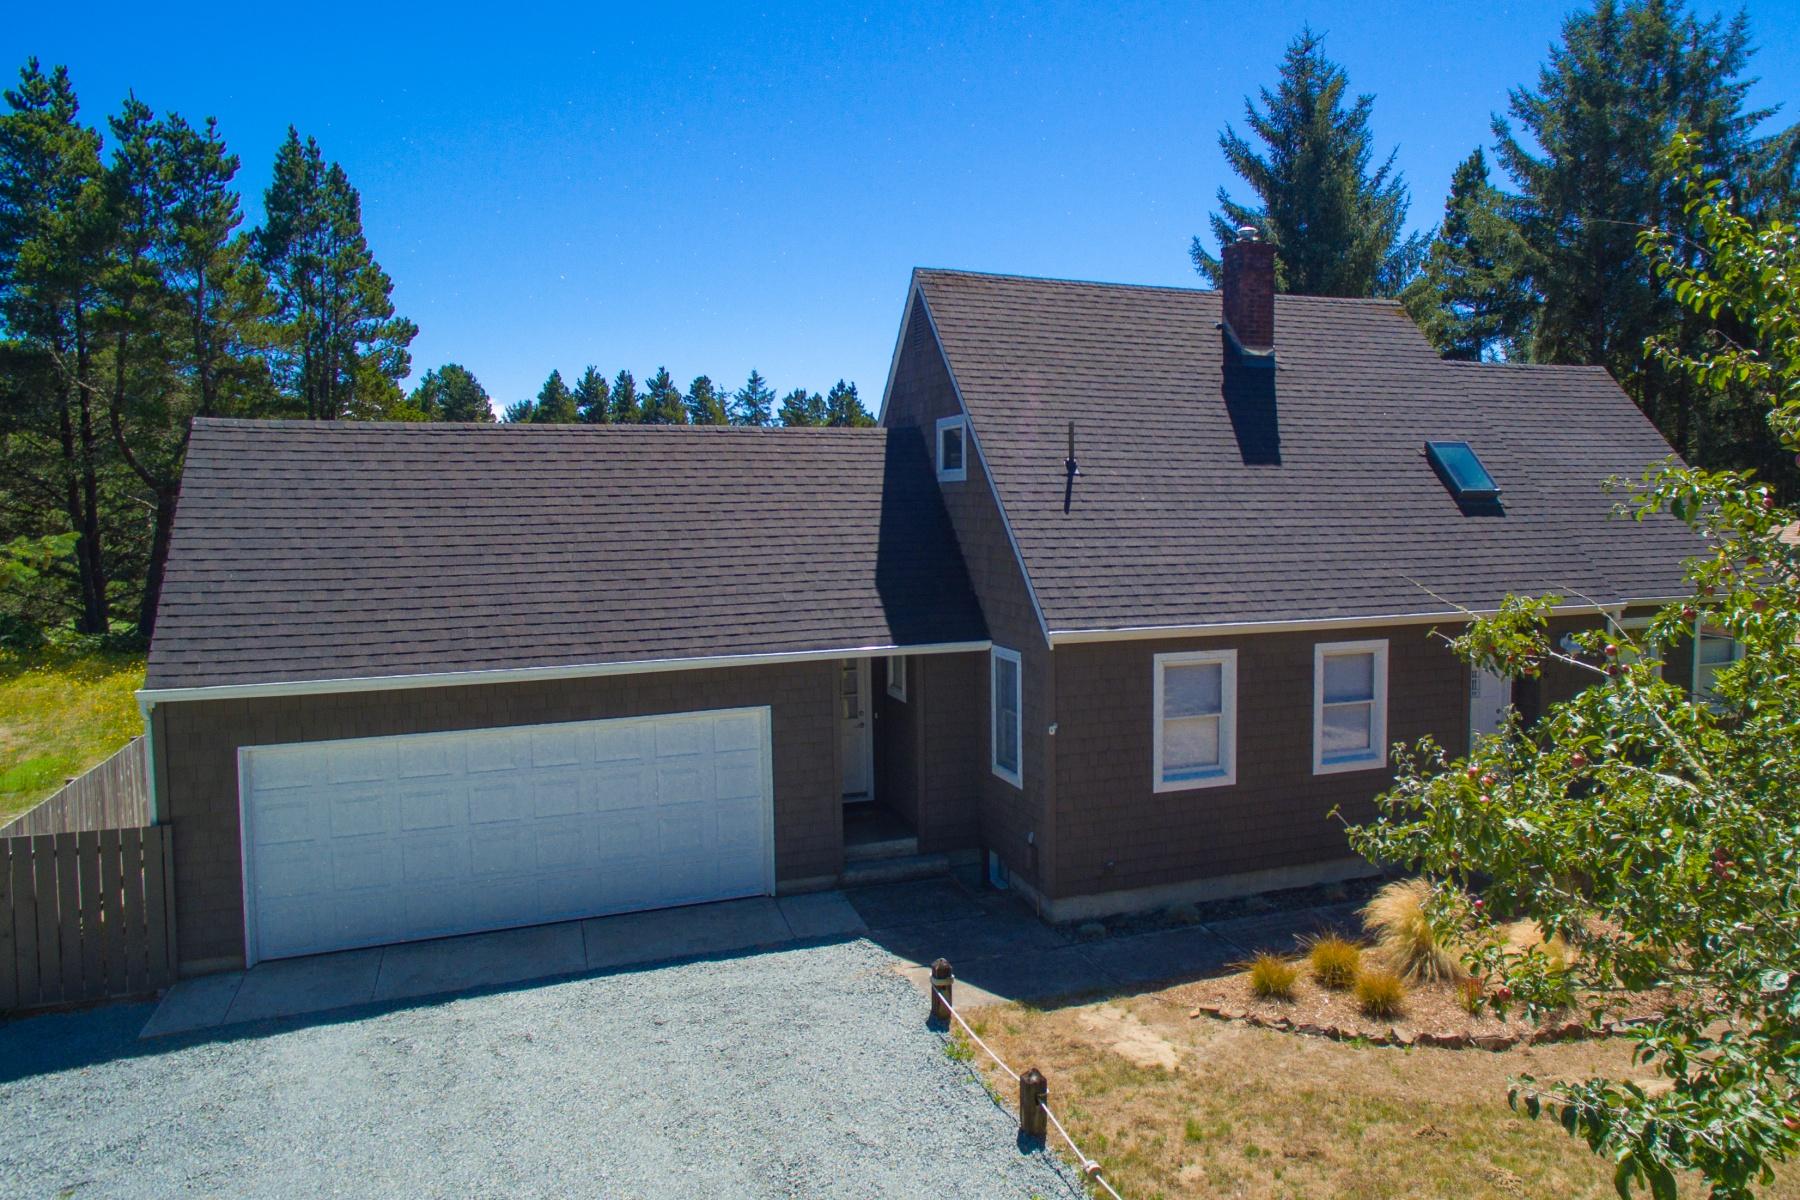 Single Family Home for Sale at 476 DORCAS LN, MANZANITA Manzanita, Oregon, 97130 United States